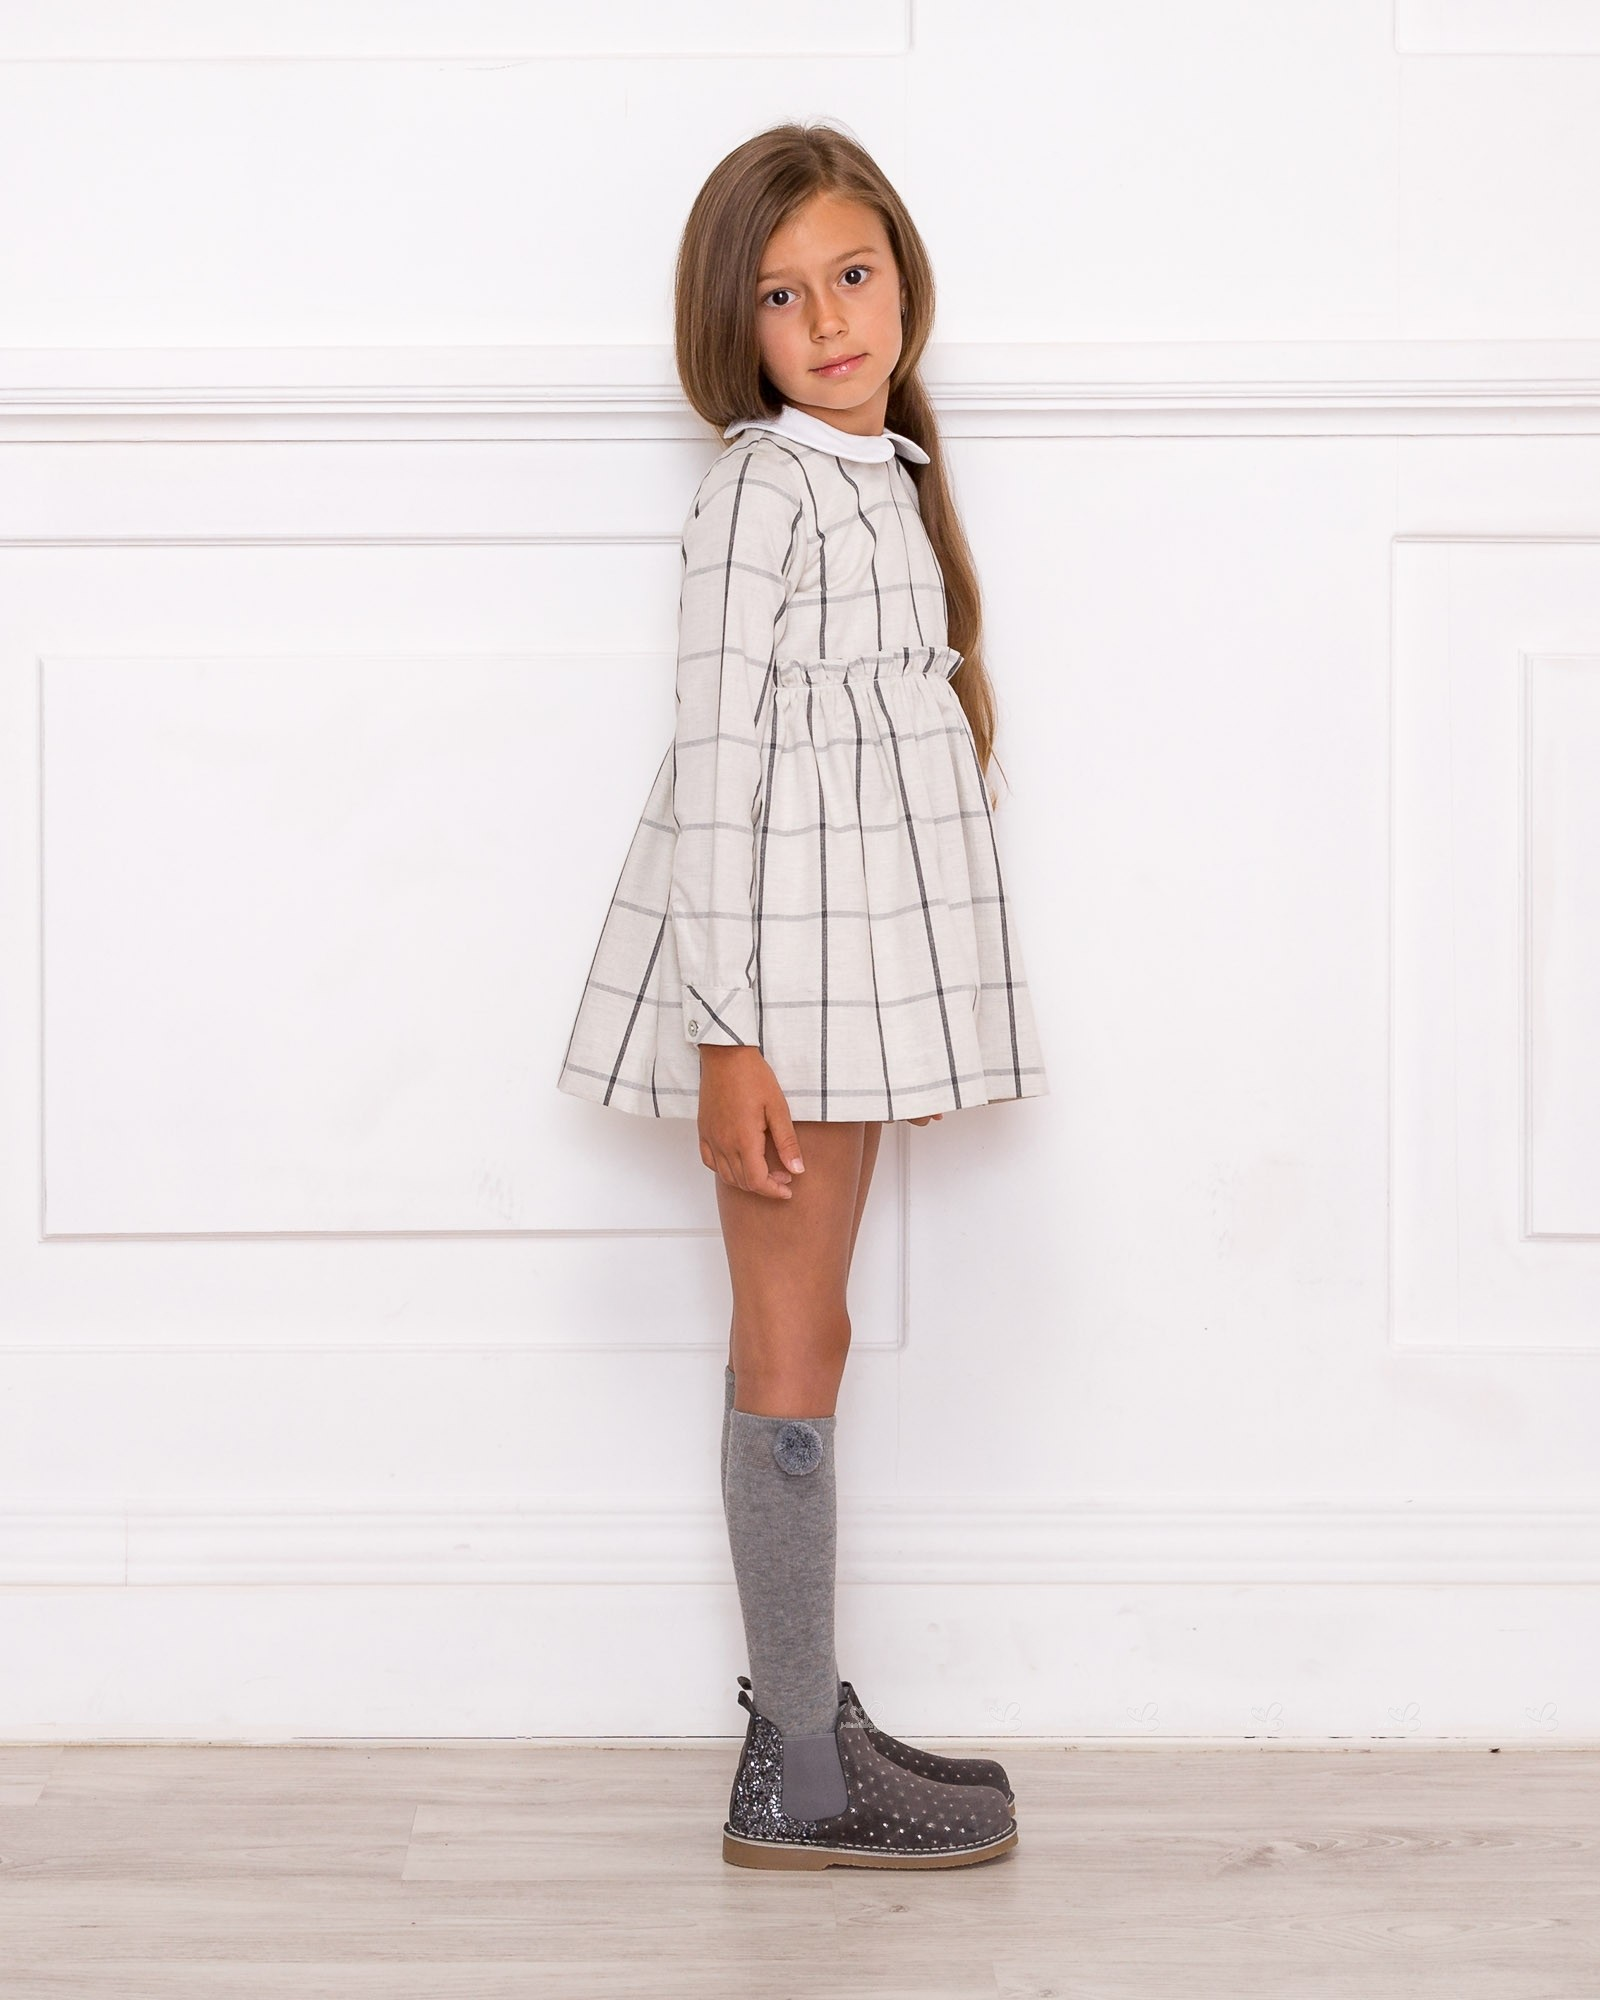 Manuela Montero Girls Gray Checked Dress with White Peter Pan Collar